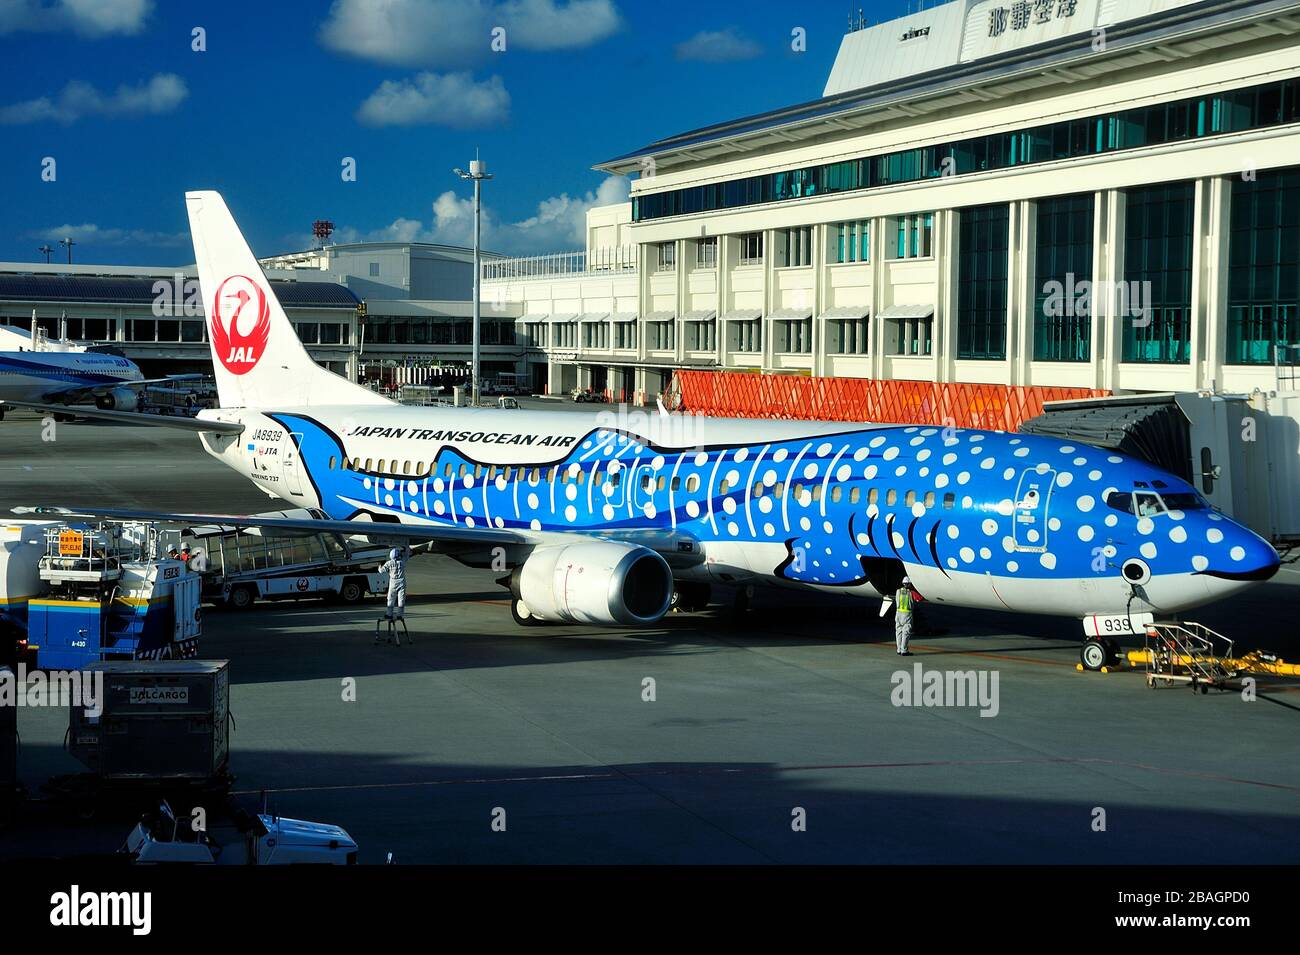 Blue Whaleshark, Boeing B-737/400, JA8939, Japan Transocean Airline, JTA, aéroport de Naha, Okinawa, îles Ryukyu, Japon Banque D'Images